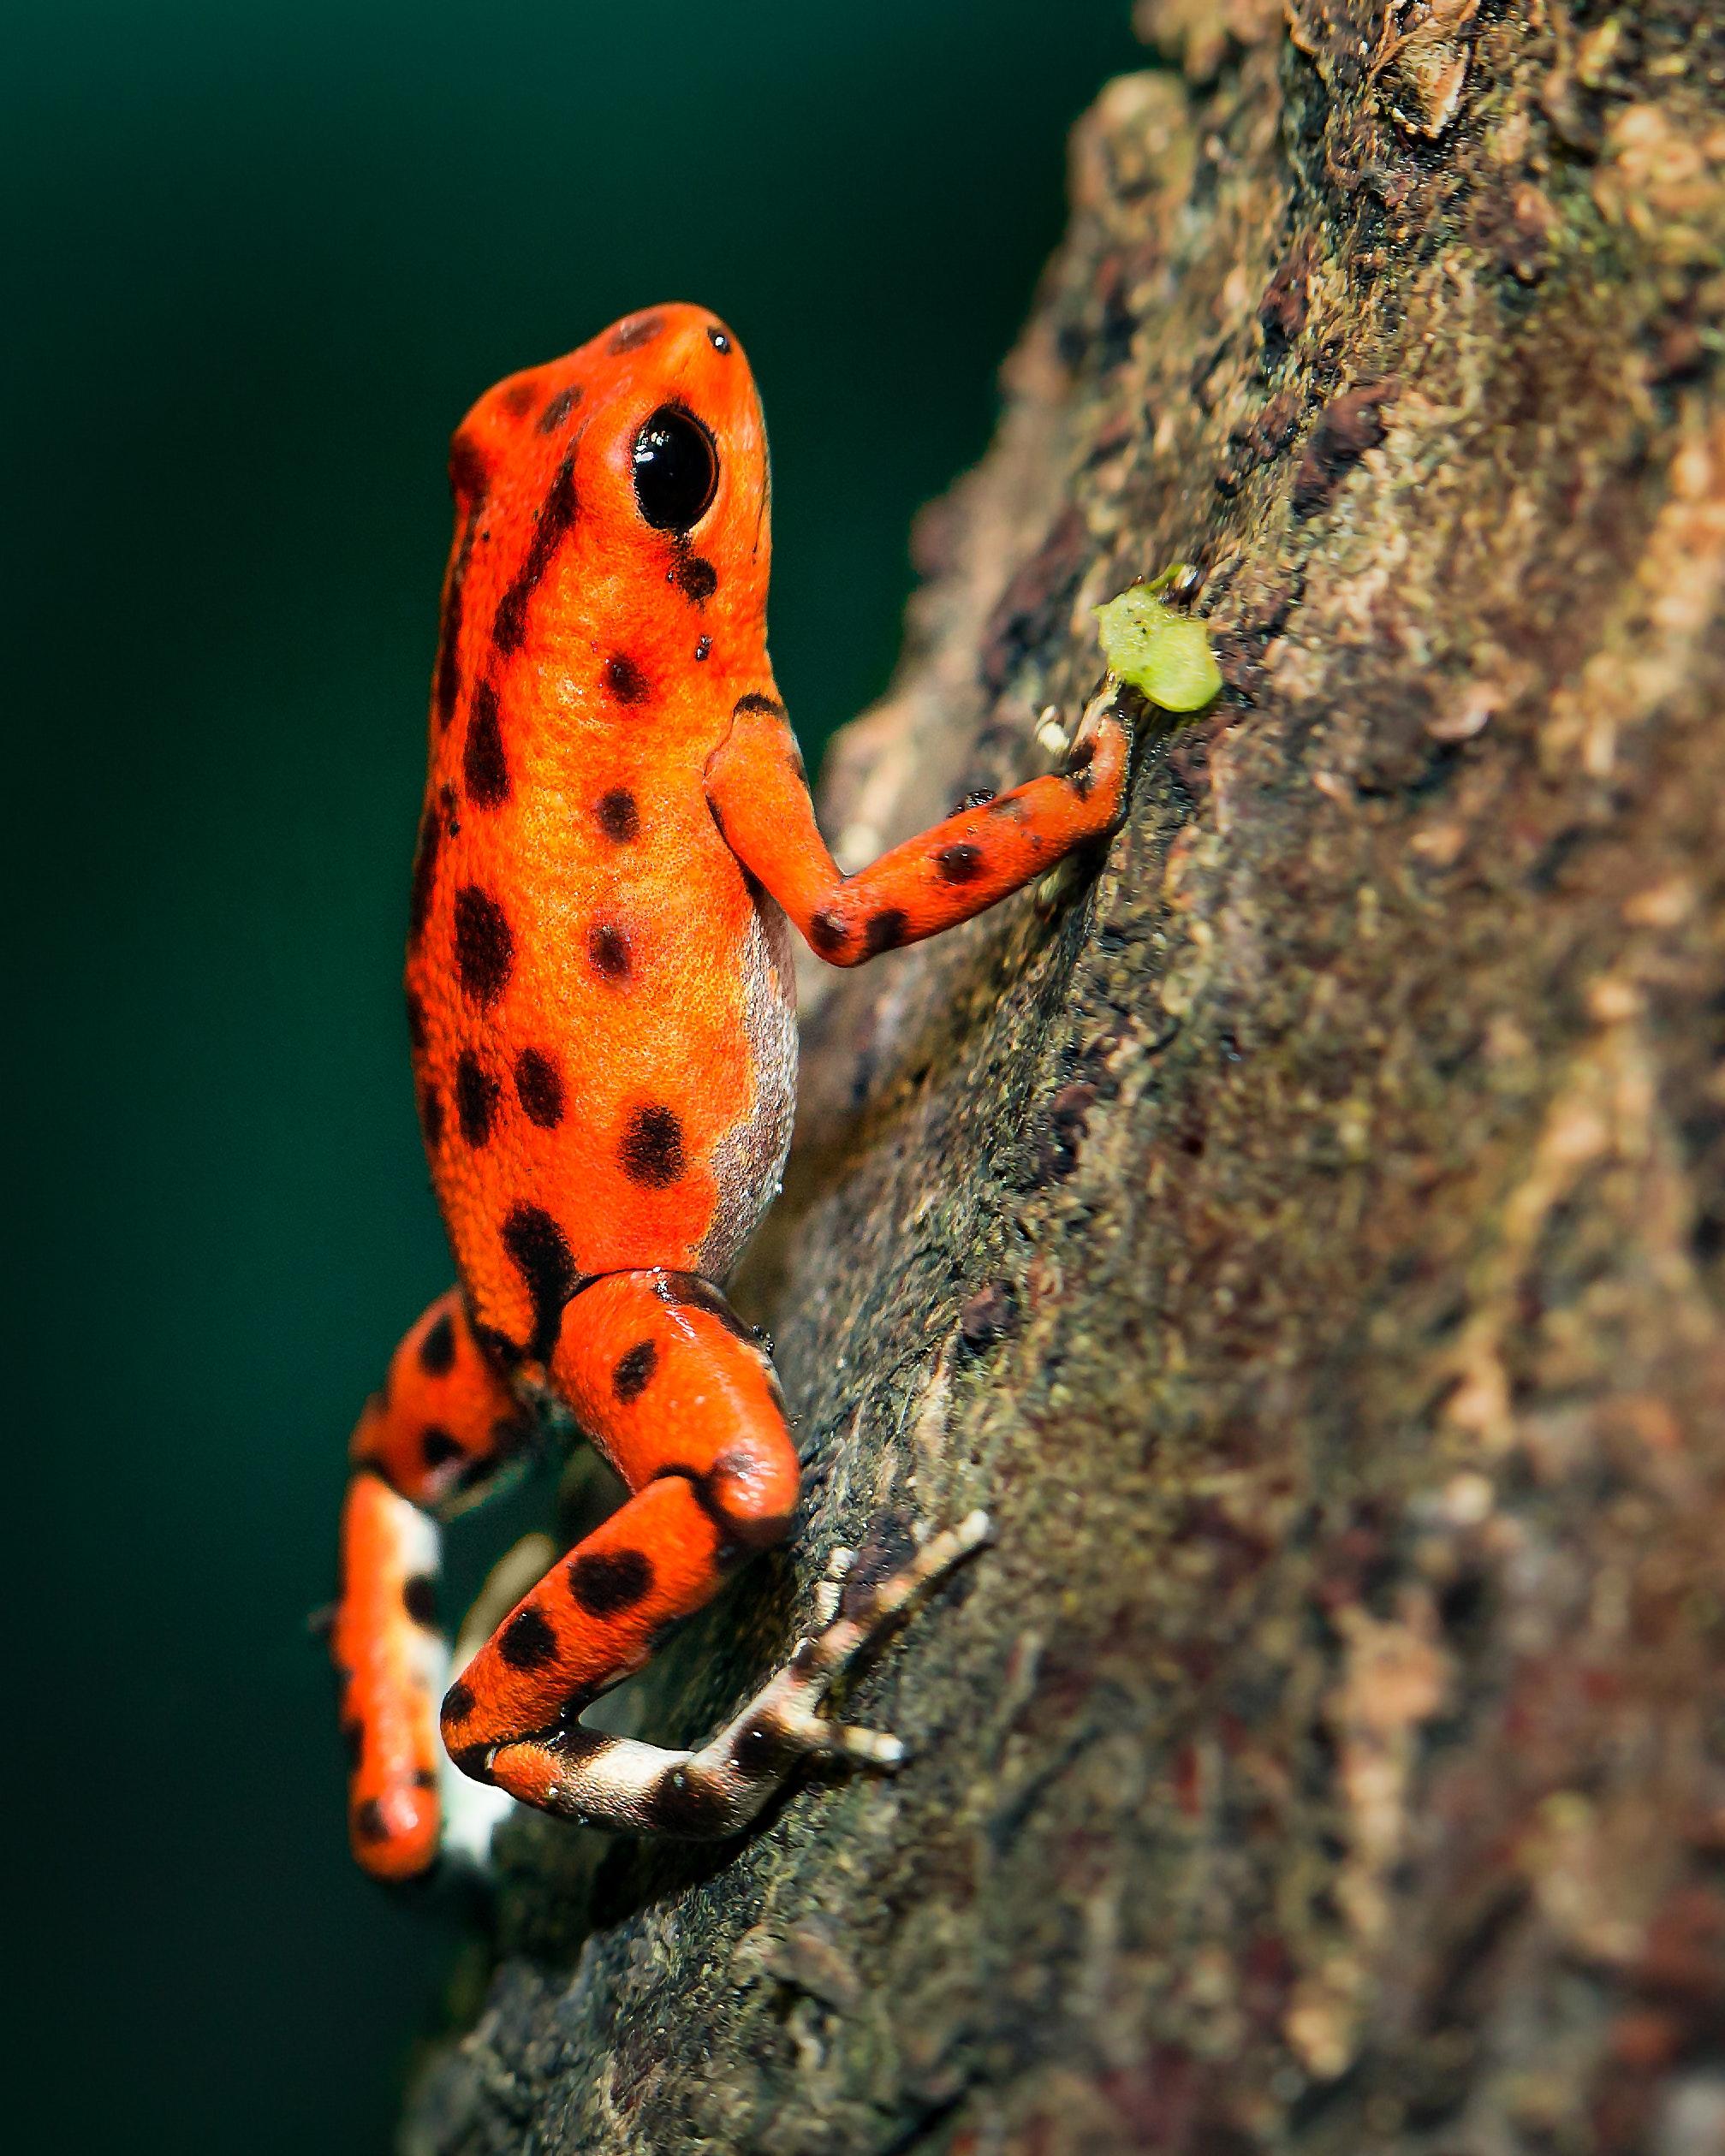 amphibian-animal-biology-638689.jpg